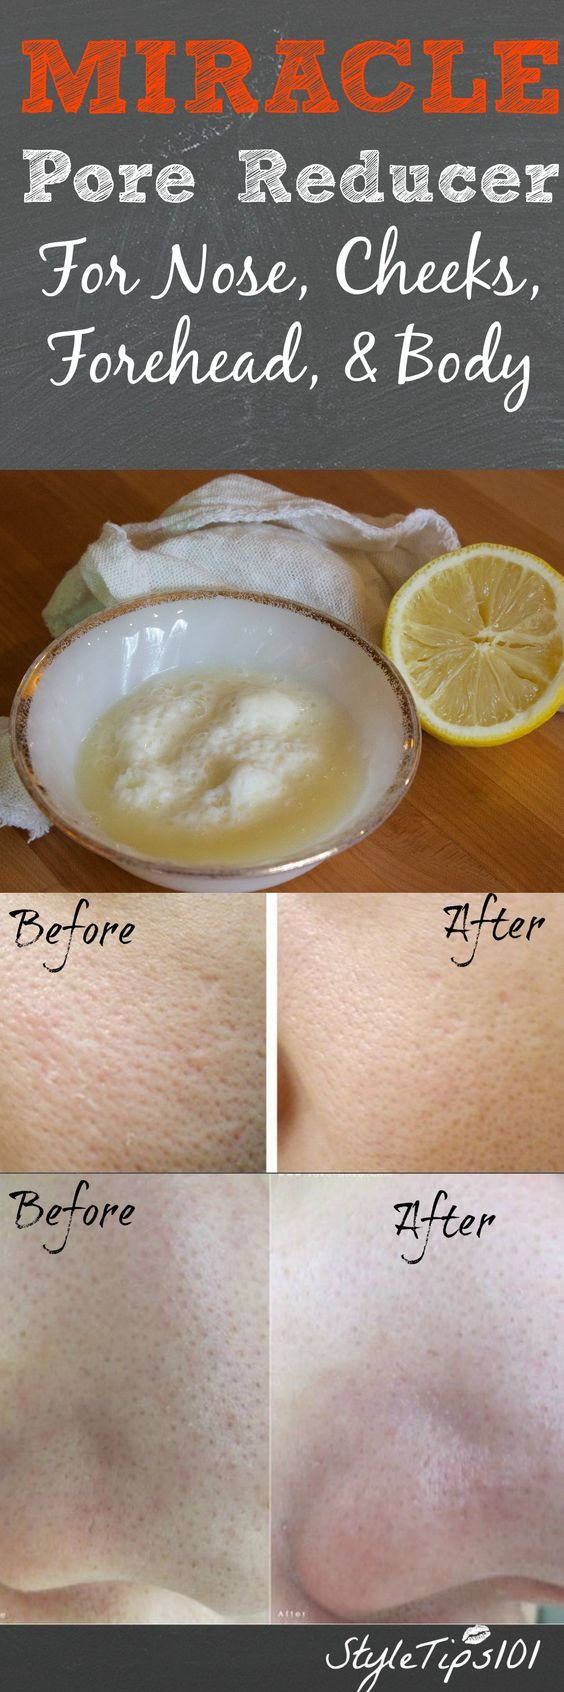 DIY Pore Reducer- 1t bkng soda, .5 t lemon juice, 1 T sugar, .5 T olive oil. Mix & apply 15-20mins. Rinse, pat dry, moisturize.